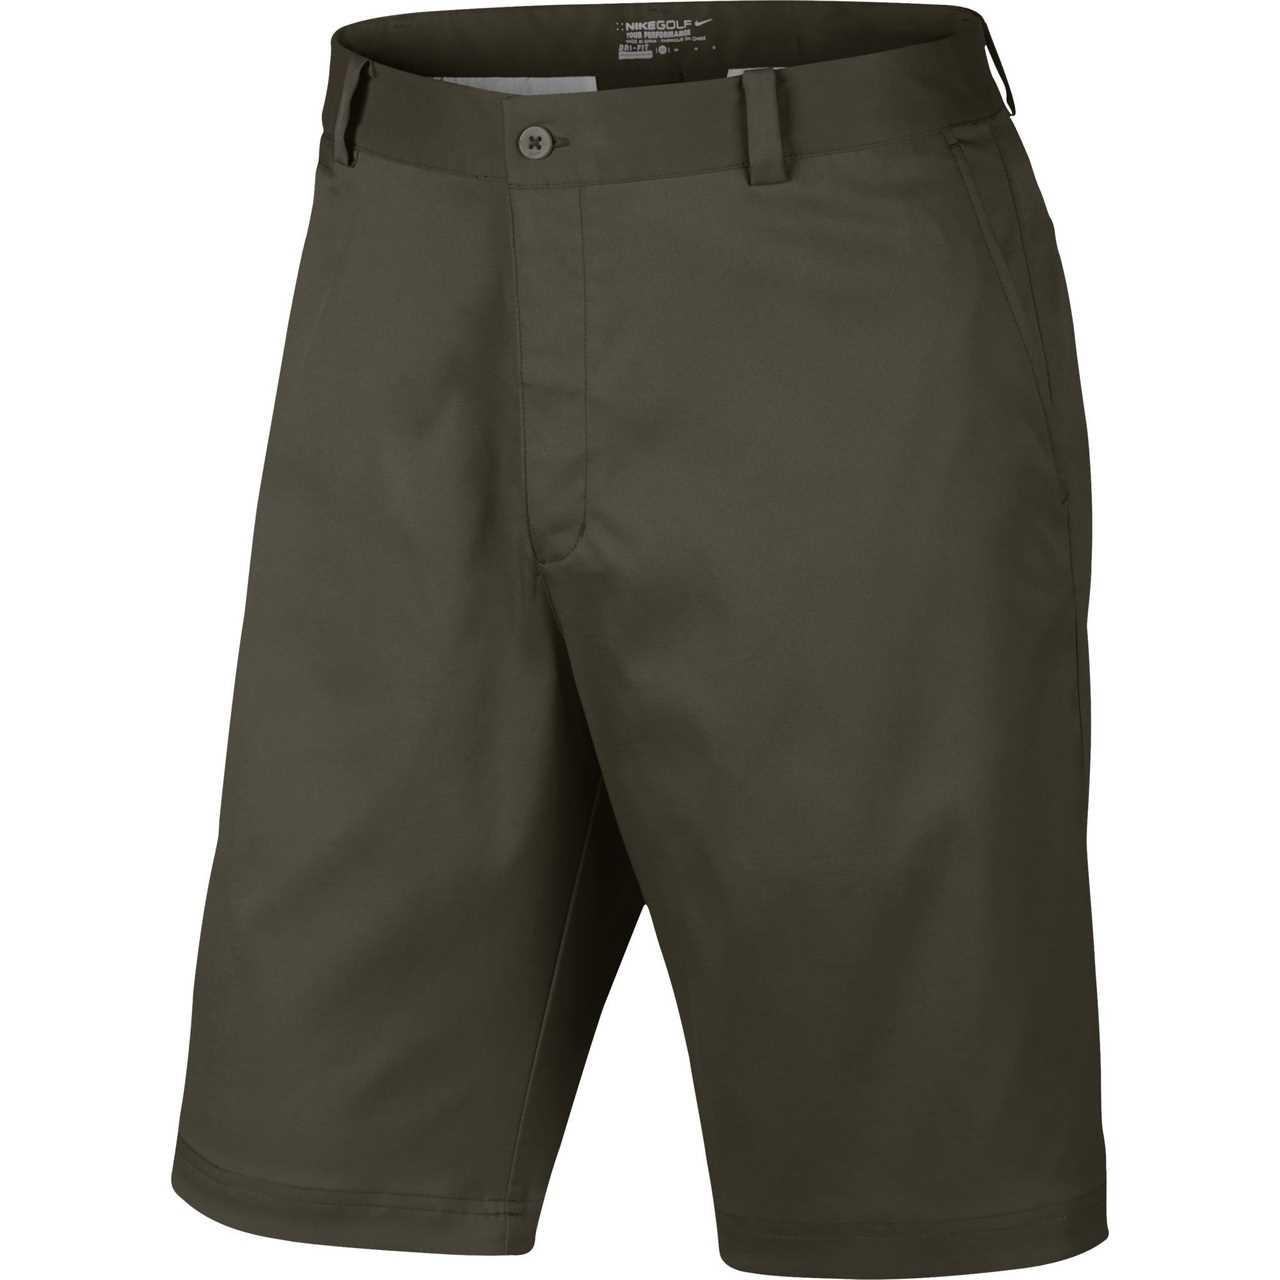 nike men u0026 39 s dri-fit flat front shorts